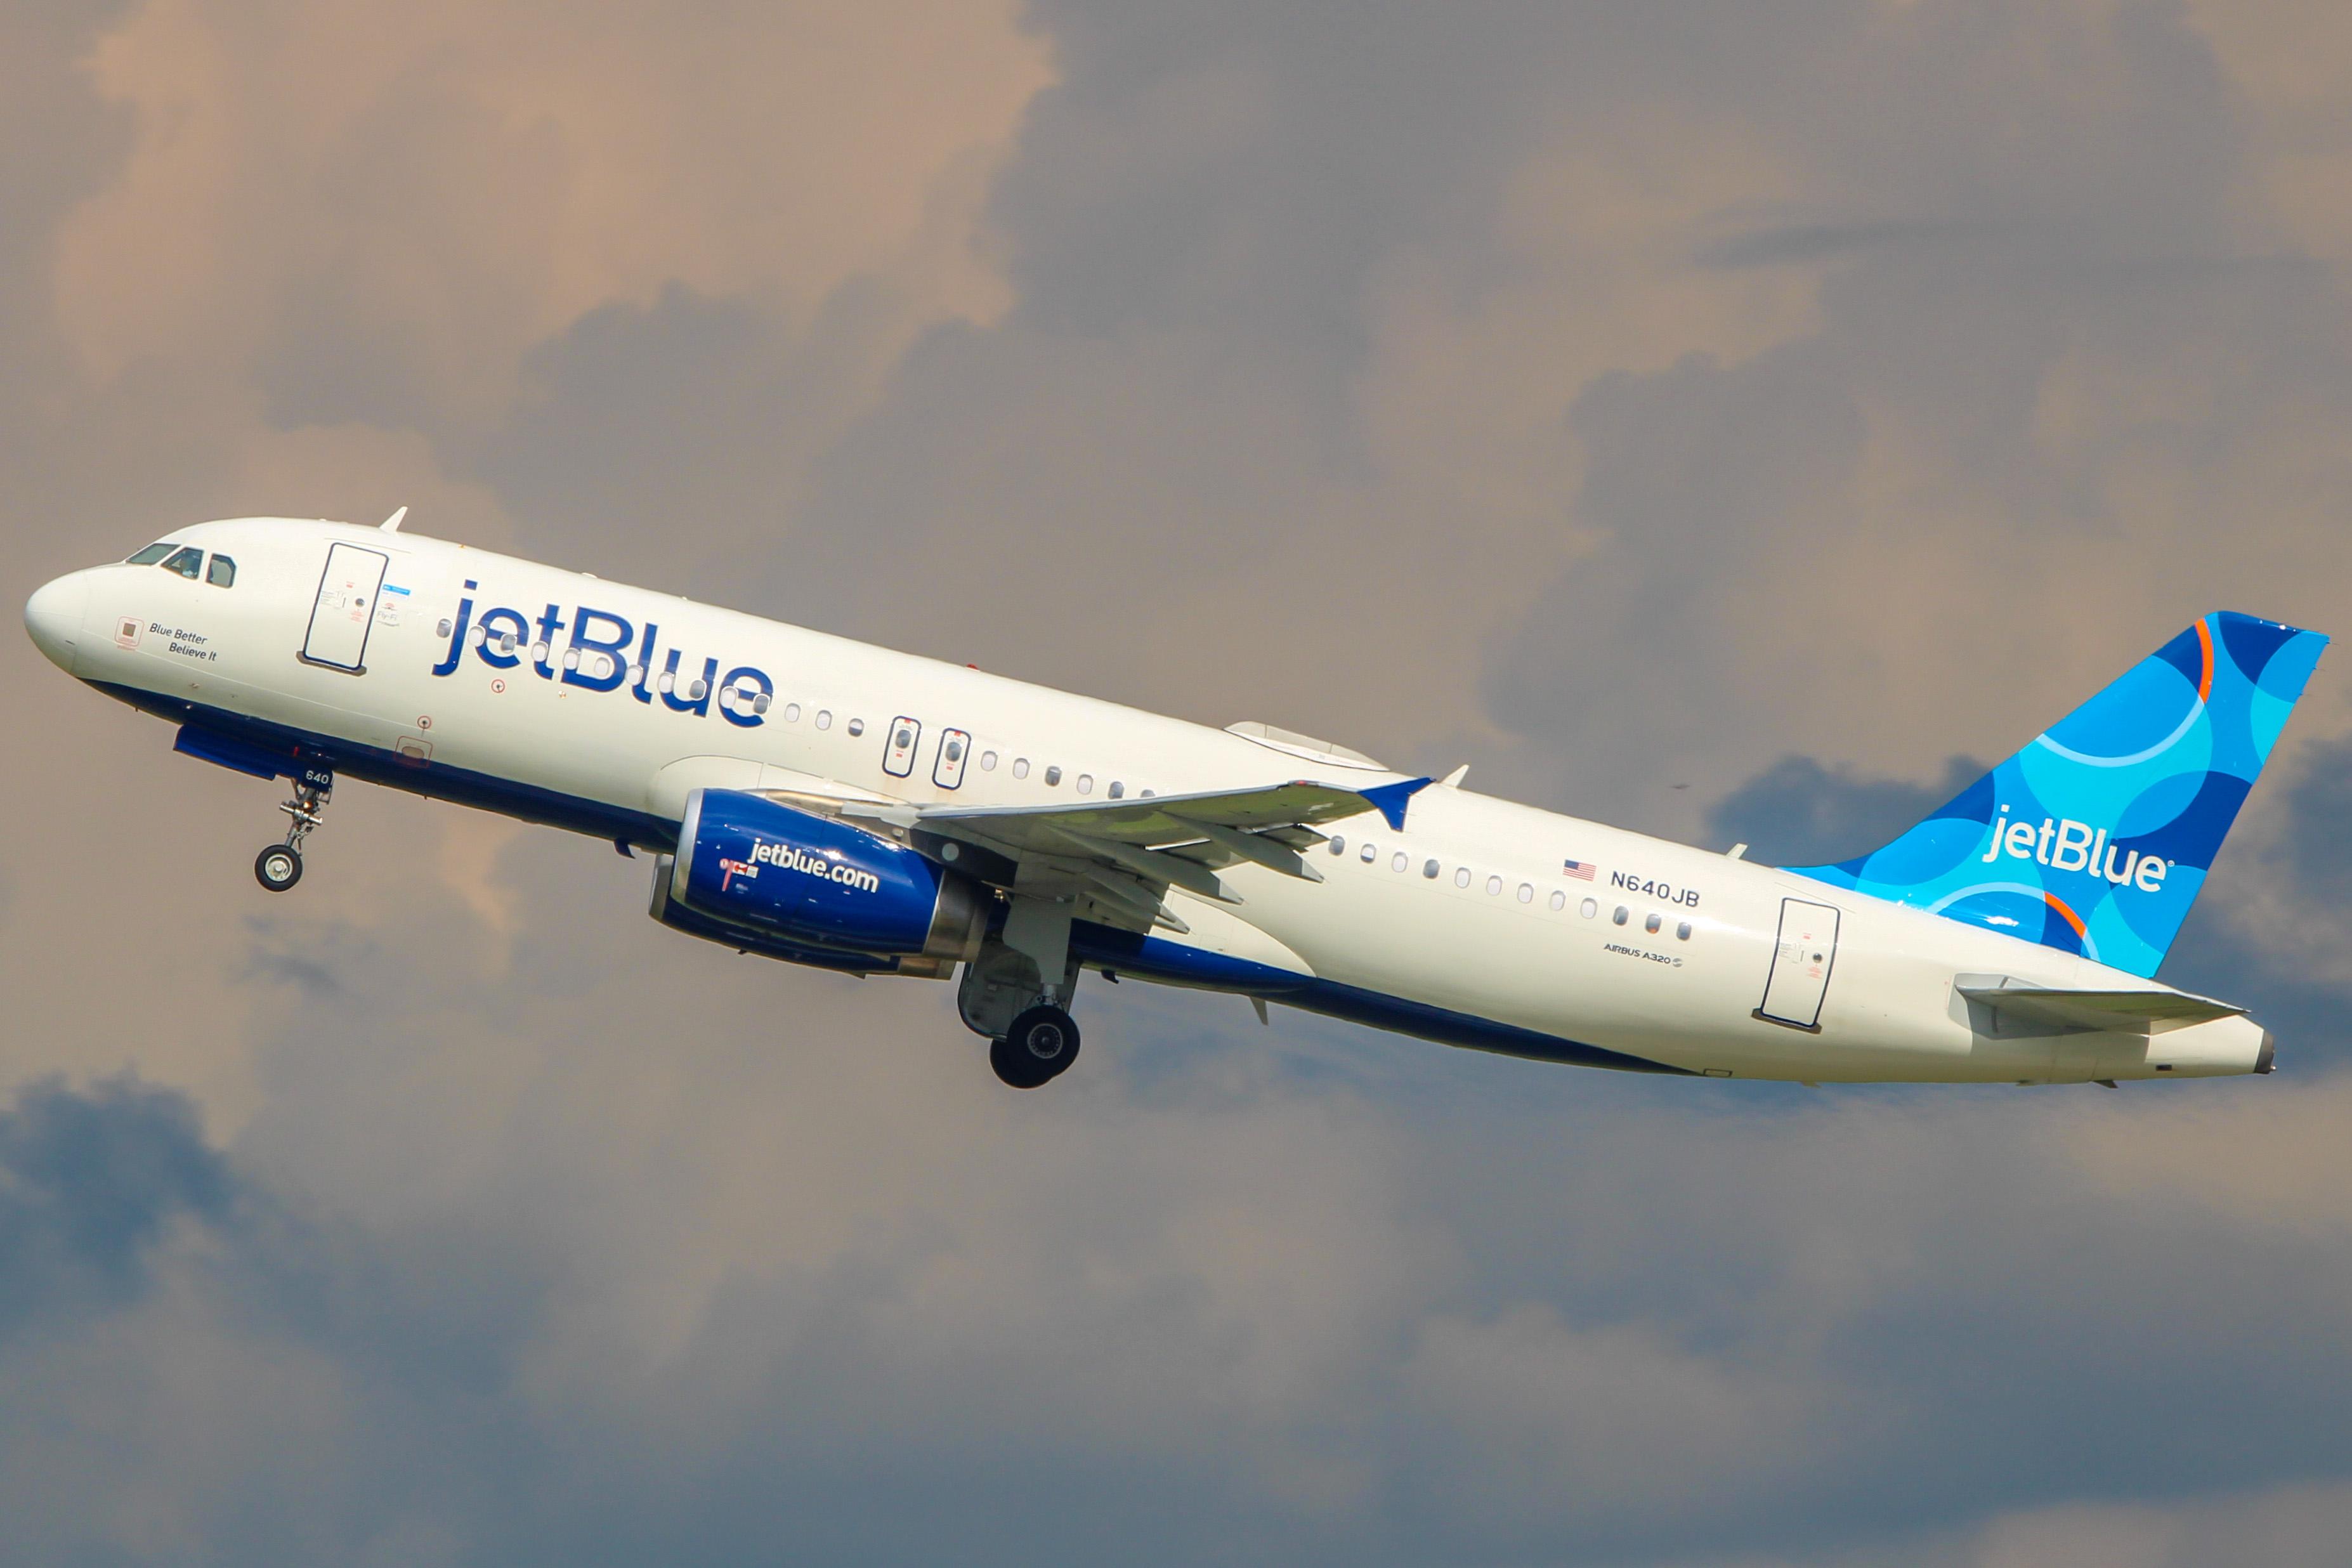 Photo of N640JB - JetBlue Airways Airbus A320 at MCO